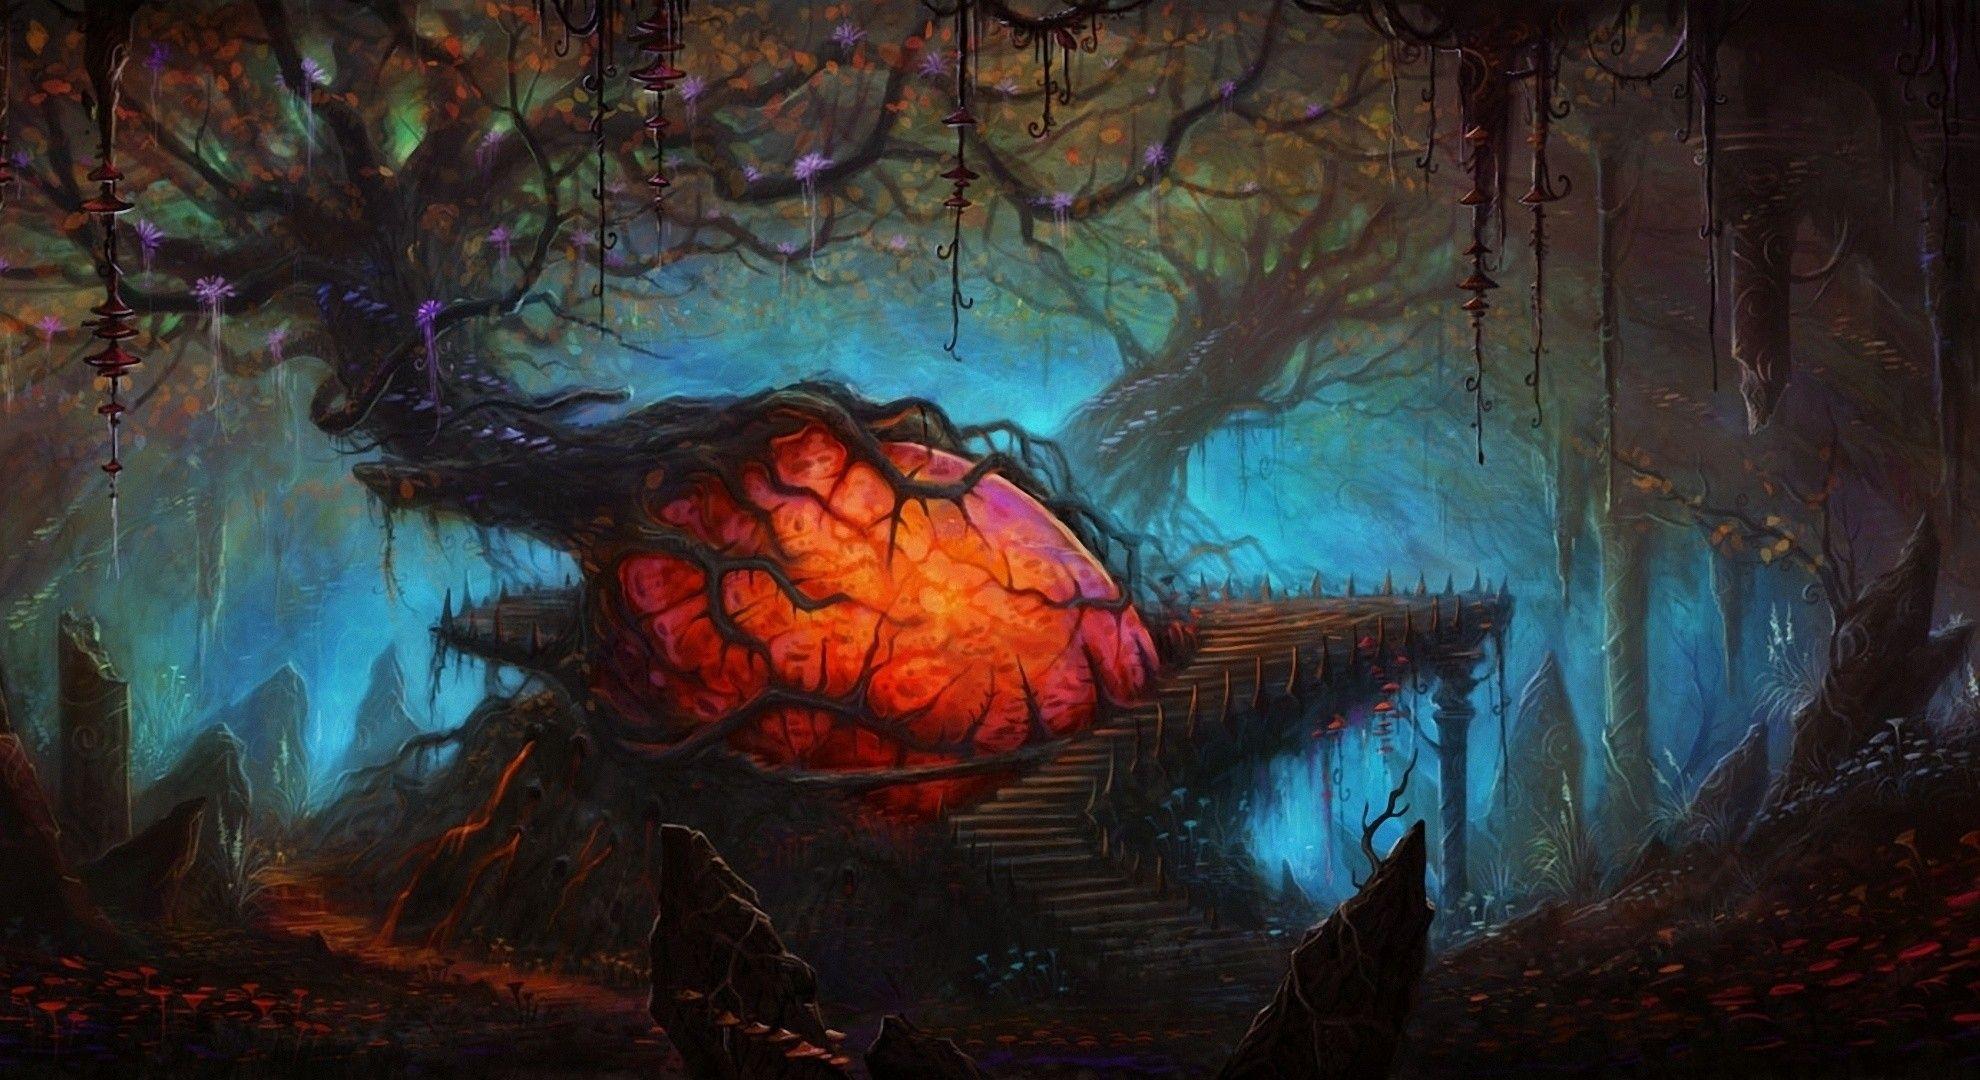 1980x1080 Fantasy Landscape Spooky Creepy Forest Dark Wallpaper Fantasy Landscape Landscape Fantastic Art